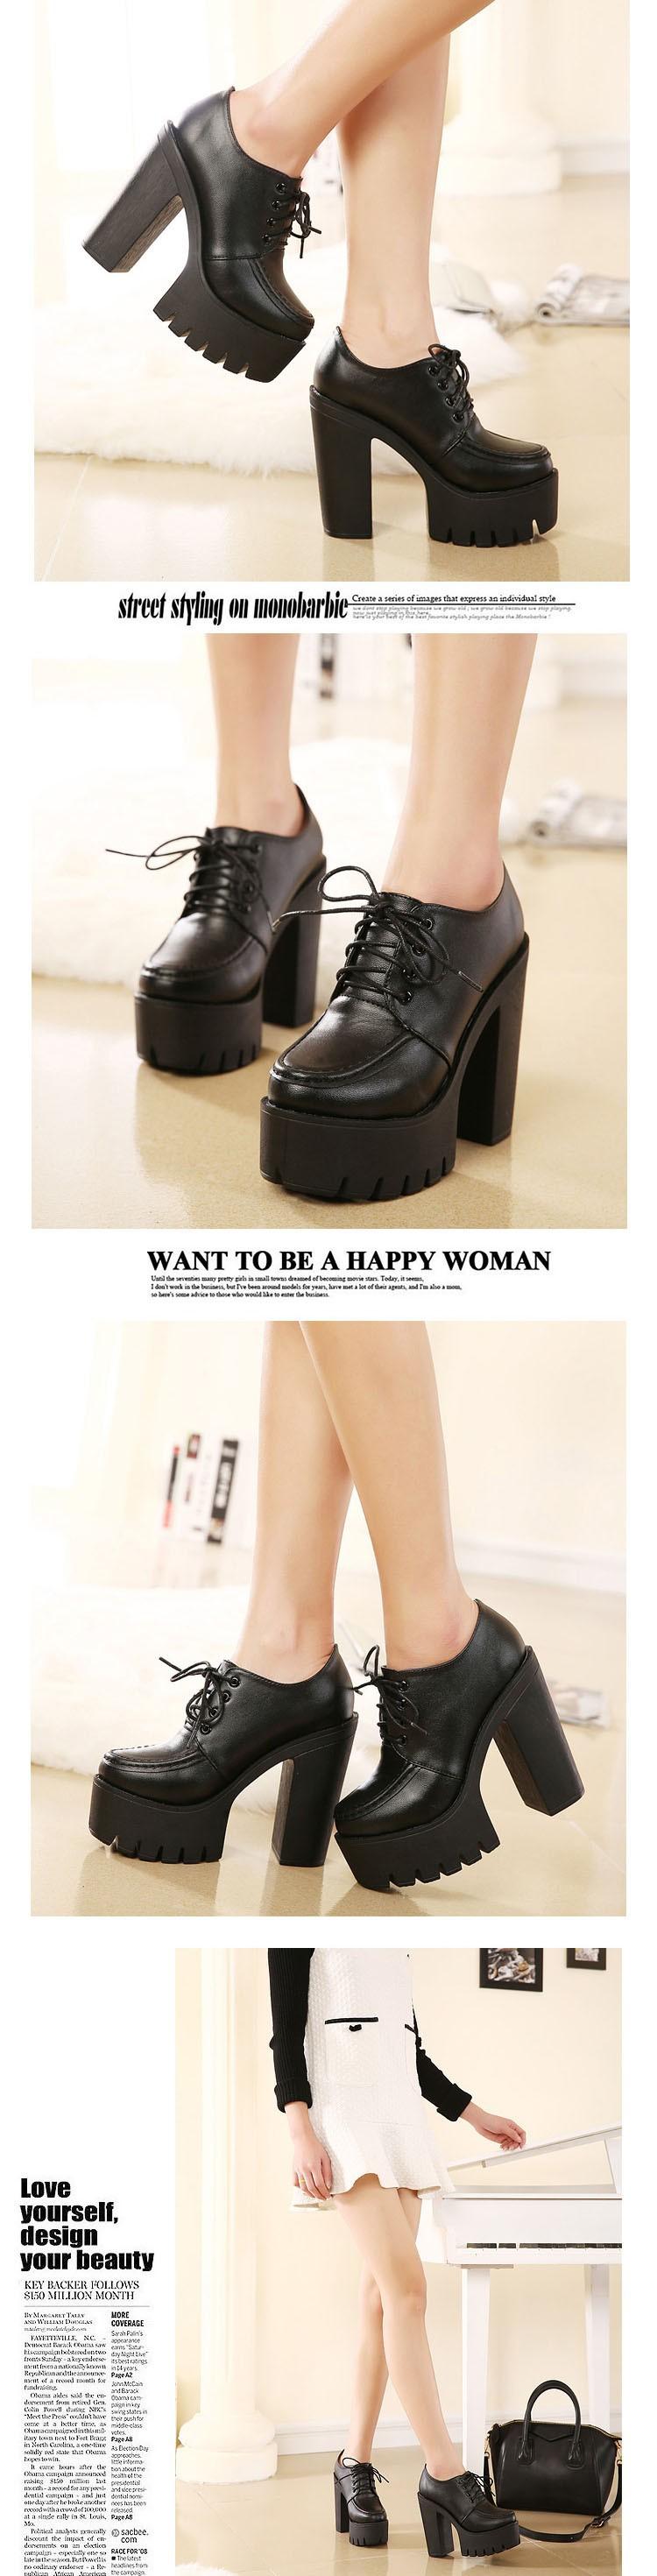 Punk Boots Spring Autumn Fashion Womens Shoes Heels Lace Up Platform